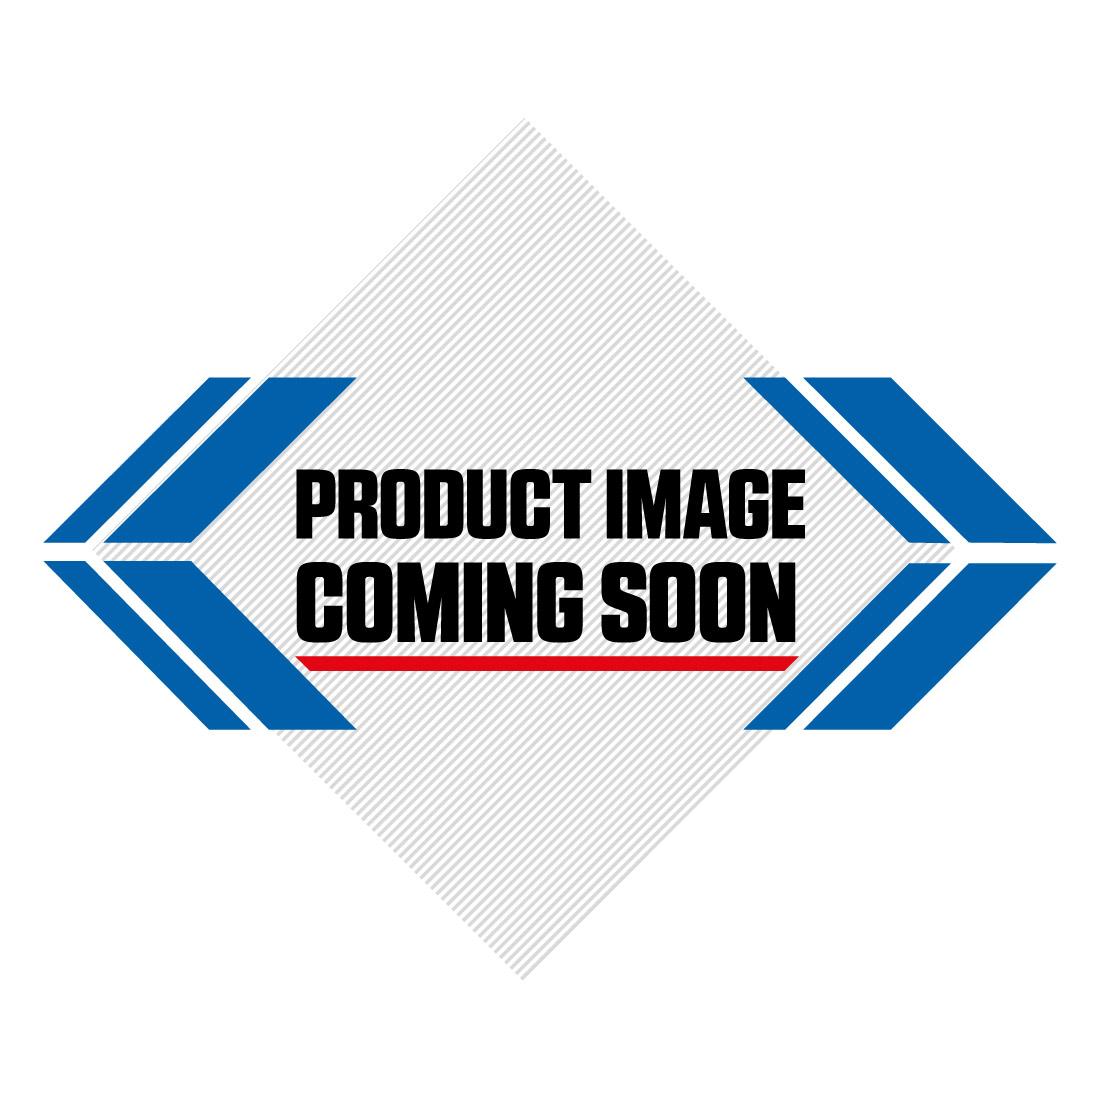 Renthal Twinring Rear Sprocket KTM SX SX-F EXC EXC-F Husqvarna TC FC TE FE - Orange Image-5>